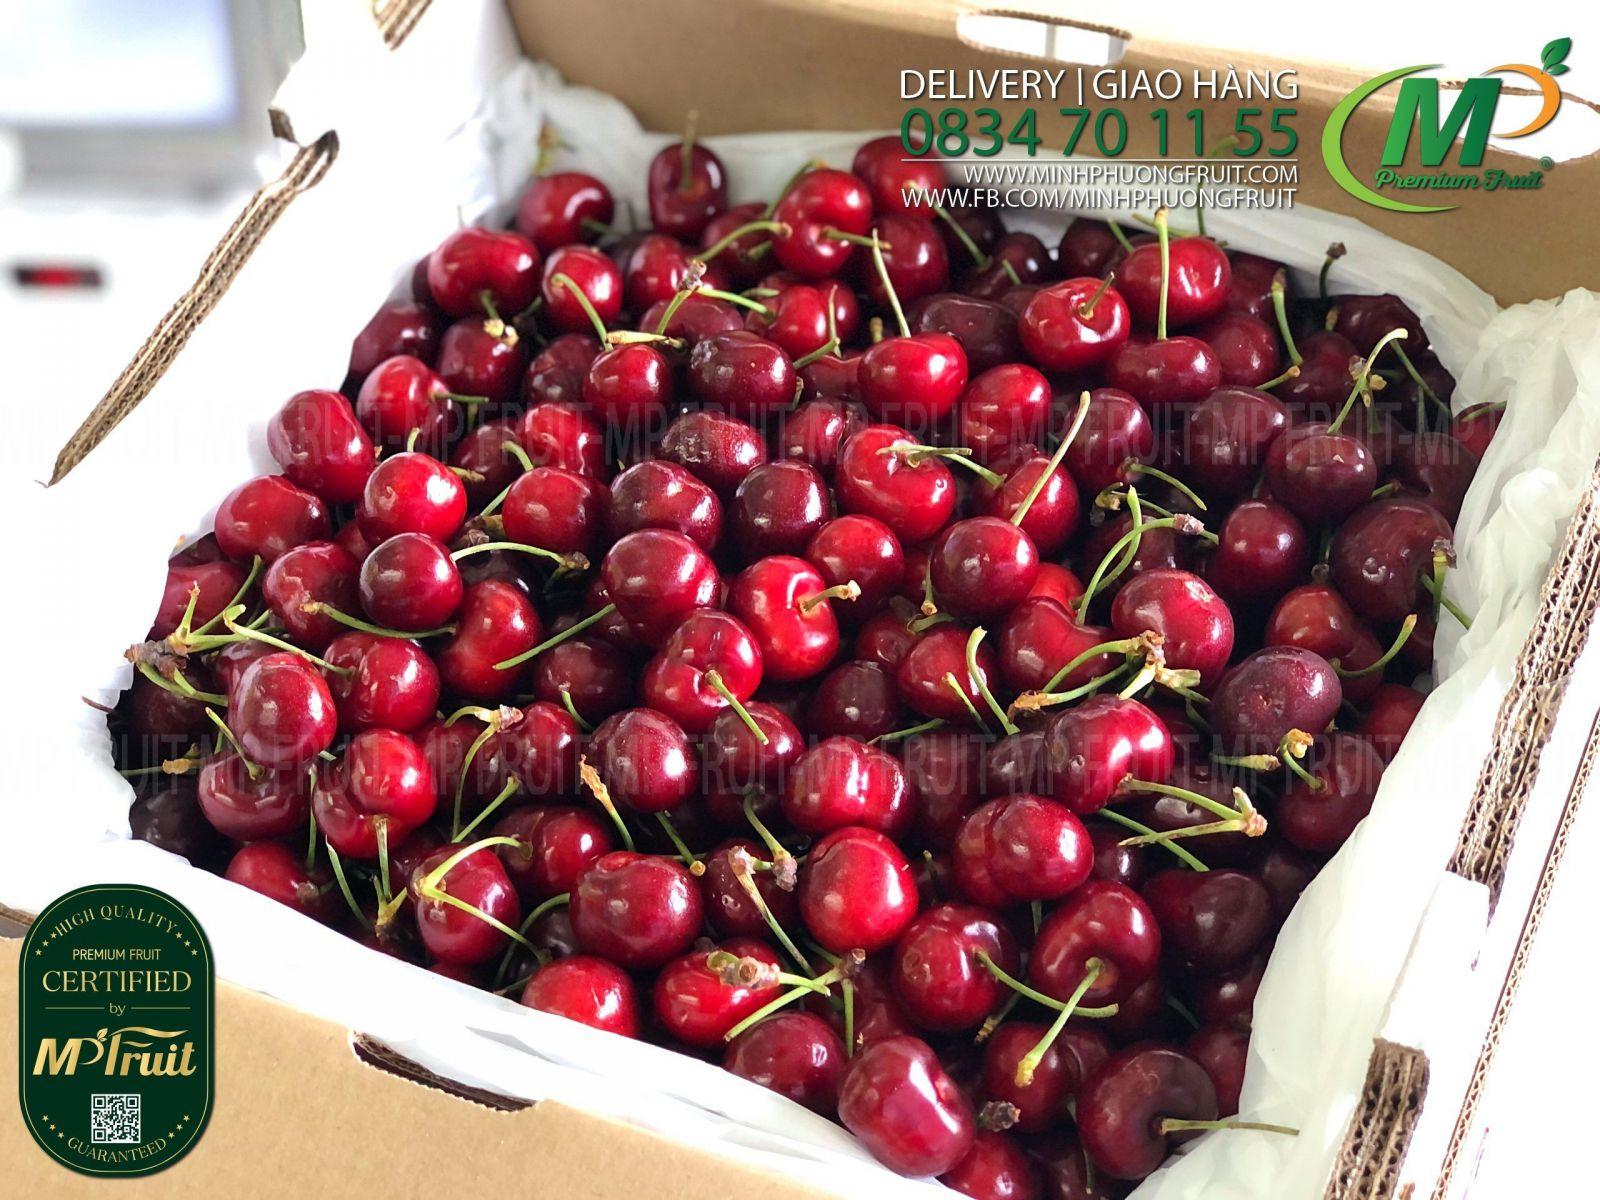 Cherry Đỏ Mỹ Size 8.5 | Sequoia tại MP Fruits